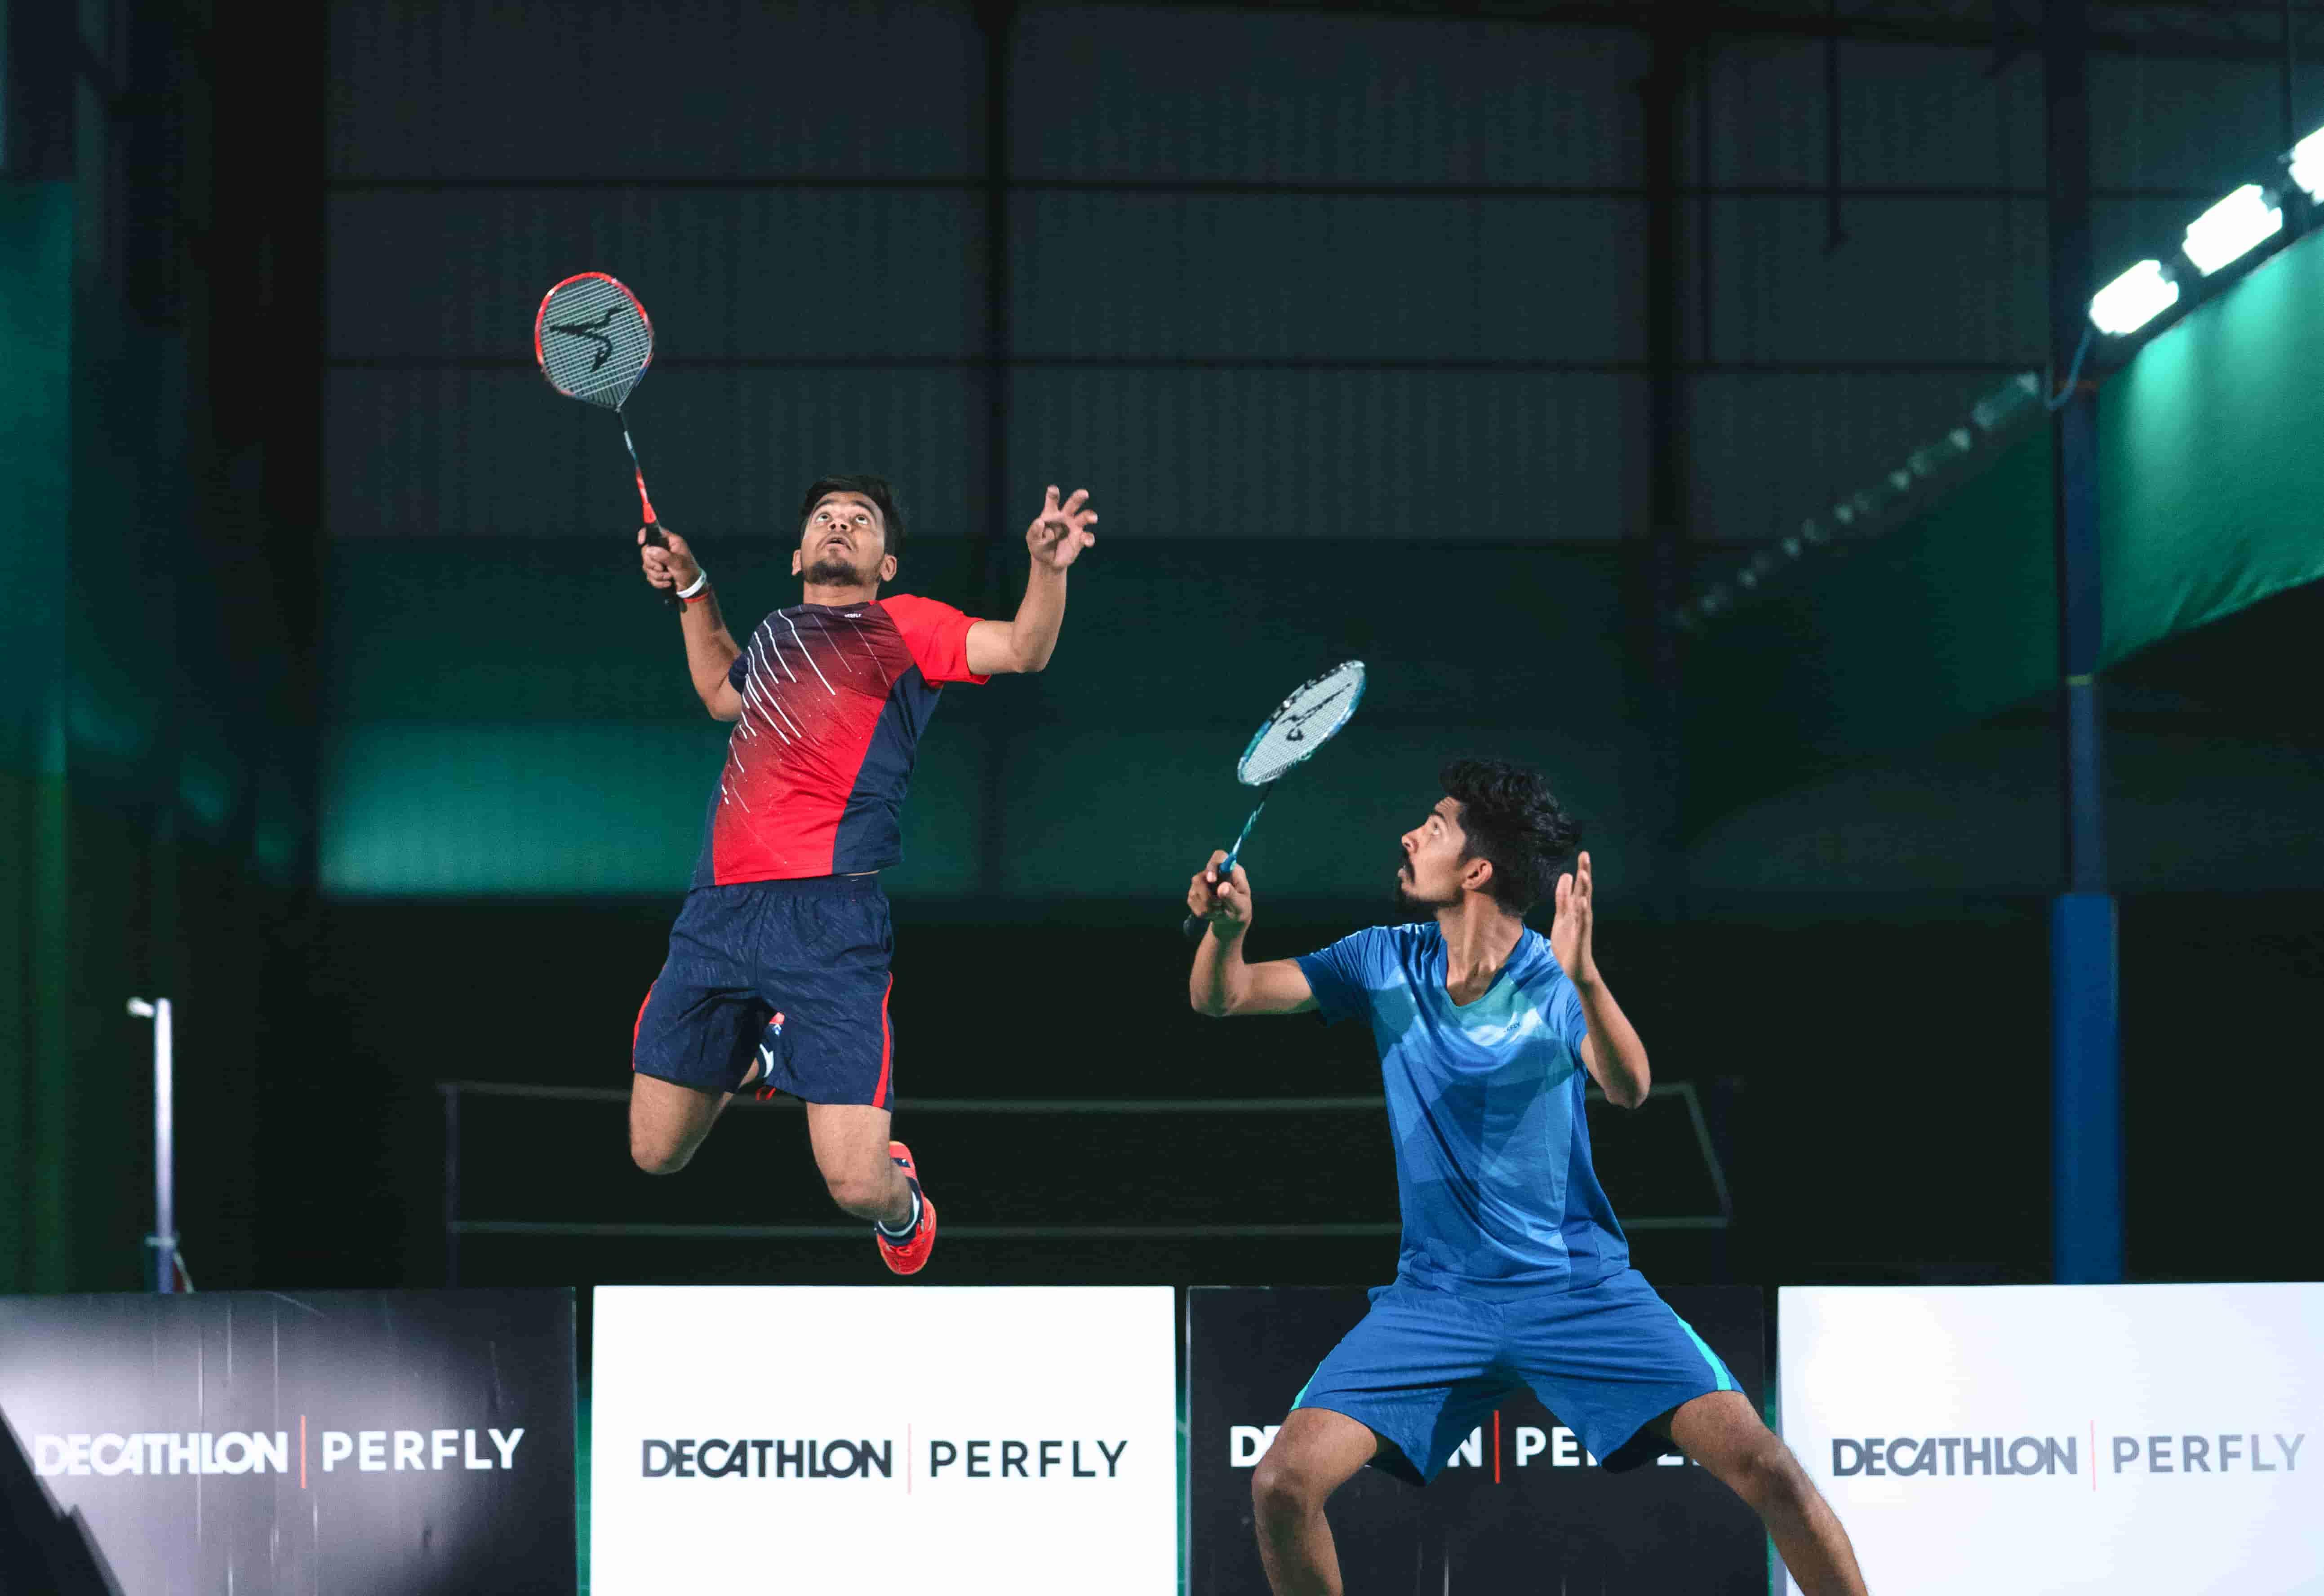 Top 10 Health Benefits Of Playing Badminton